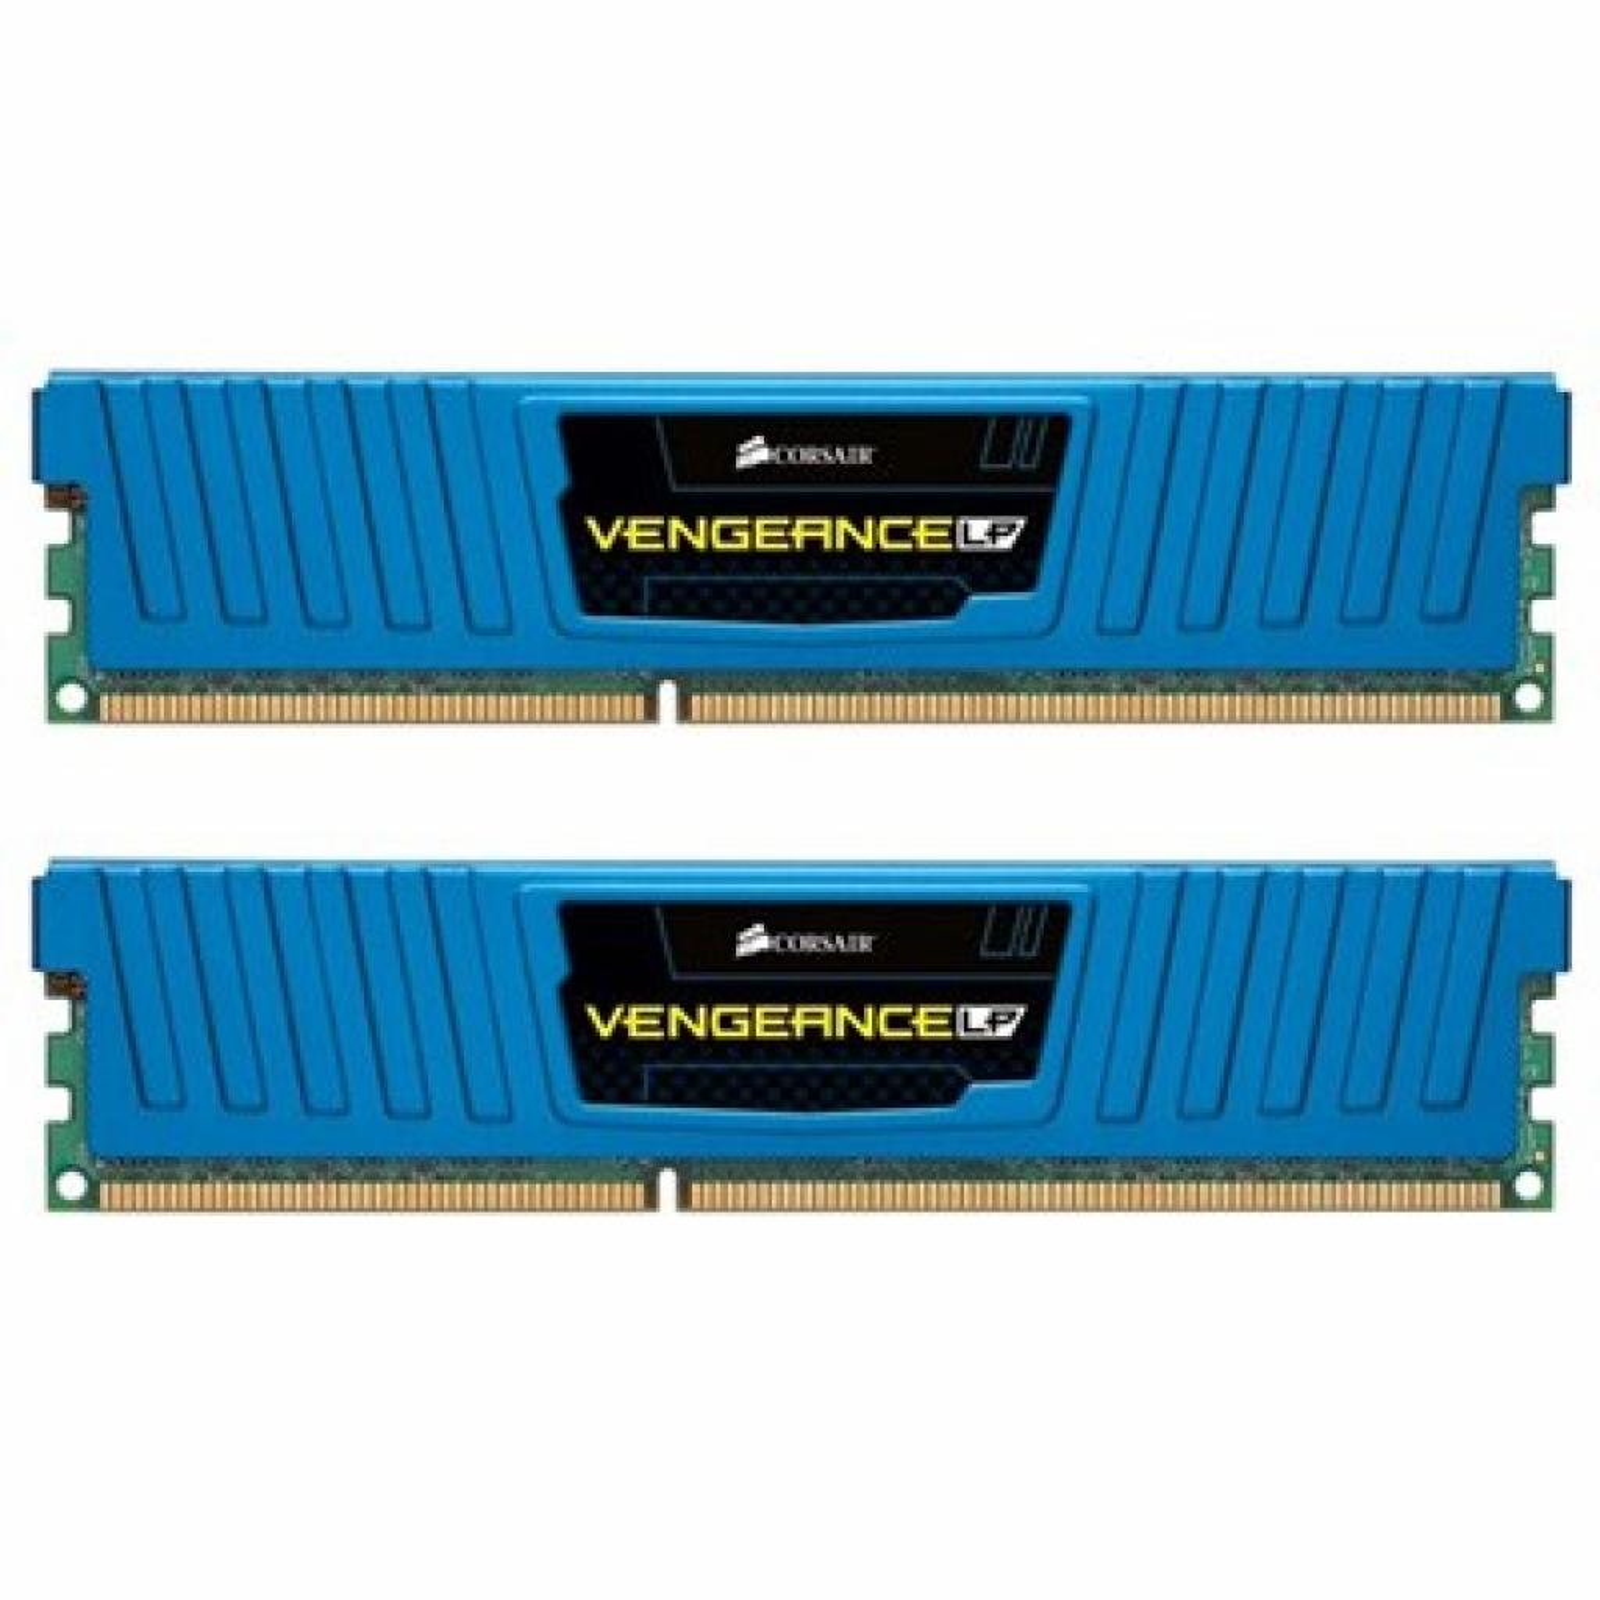 Модуль памяти для компьютера DDR3 8GB (2x4GB) 1866 MHz CORSAIR (CML8GX3M2A1866C9B)